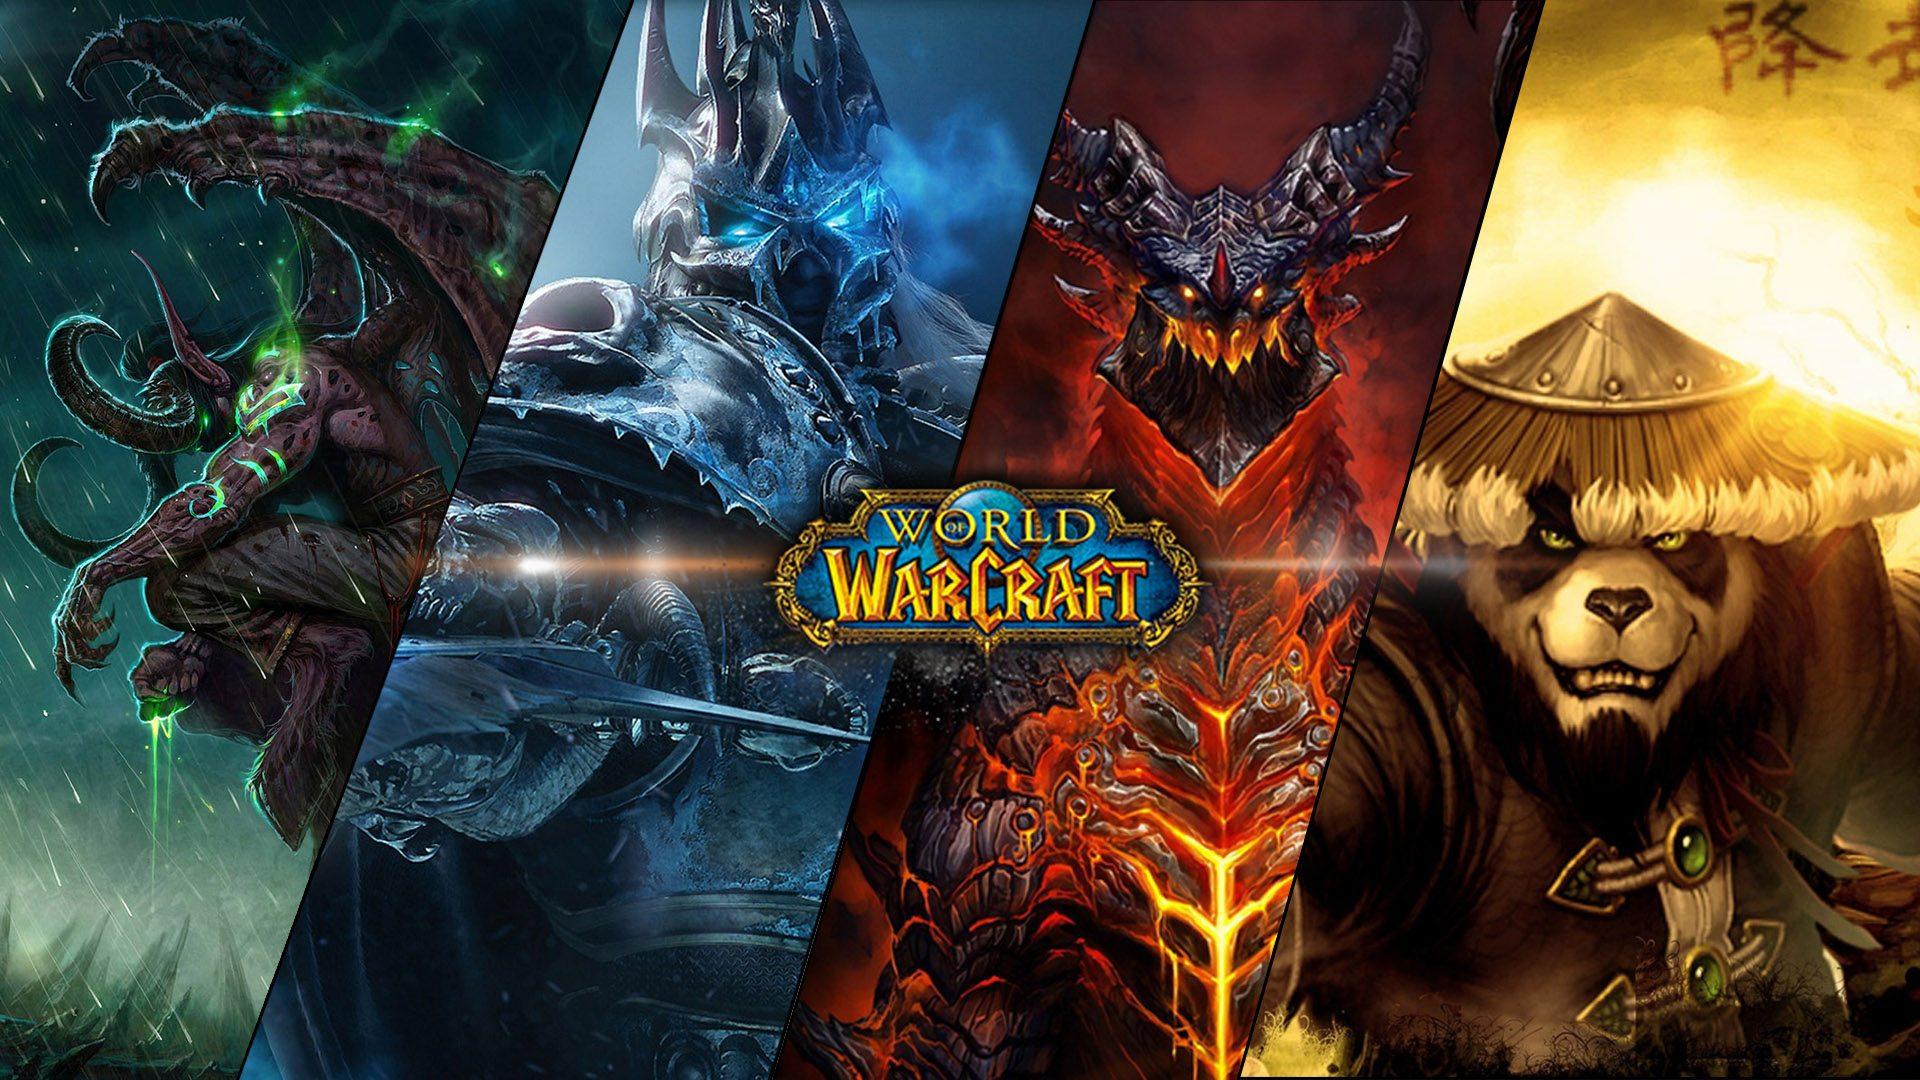 Mondo Warcraft dating Incontri VIP Sri Lanka